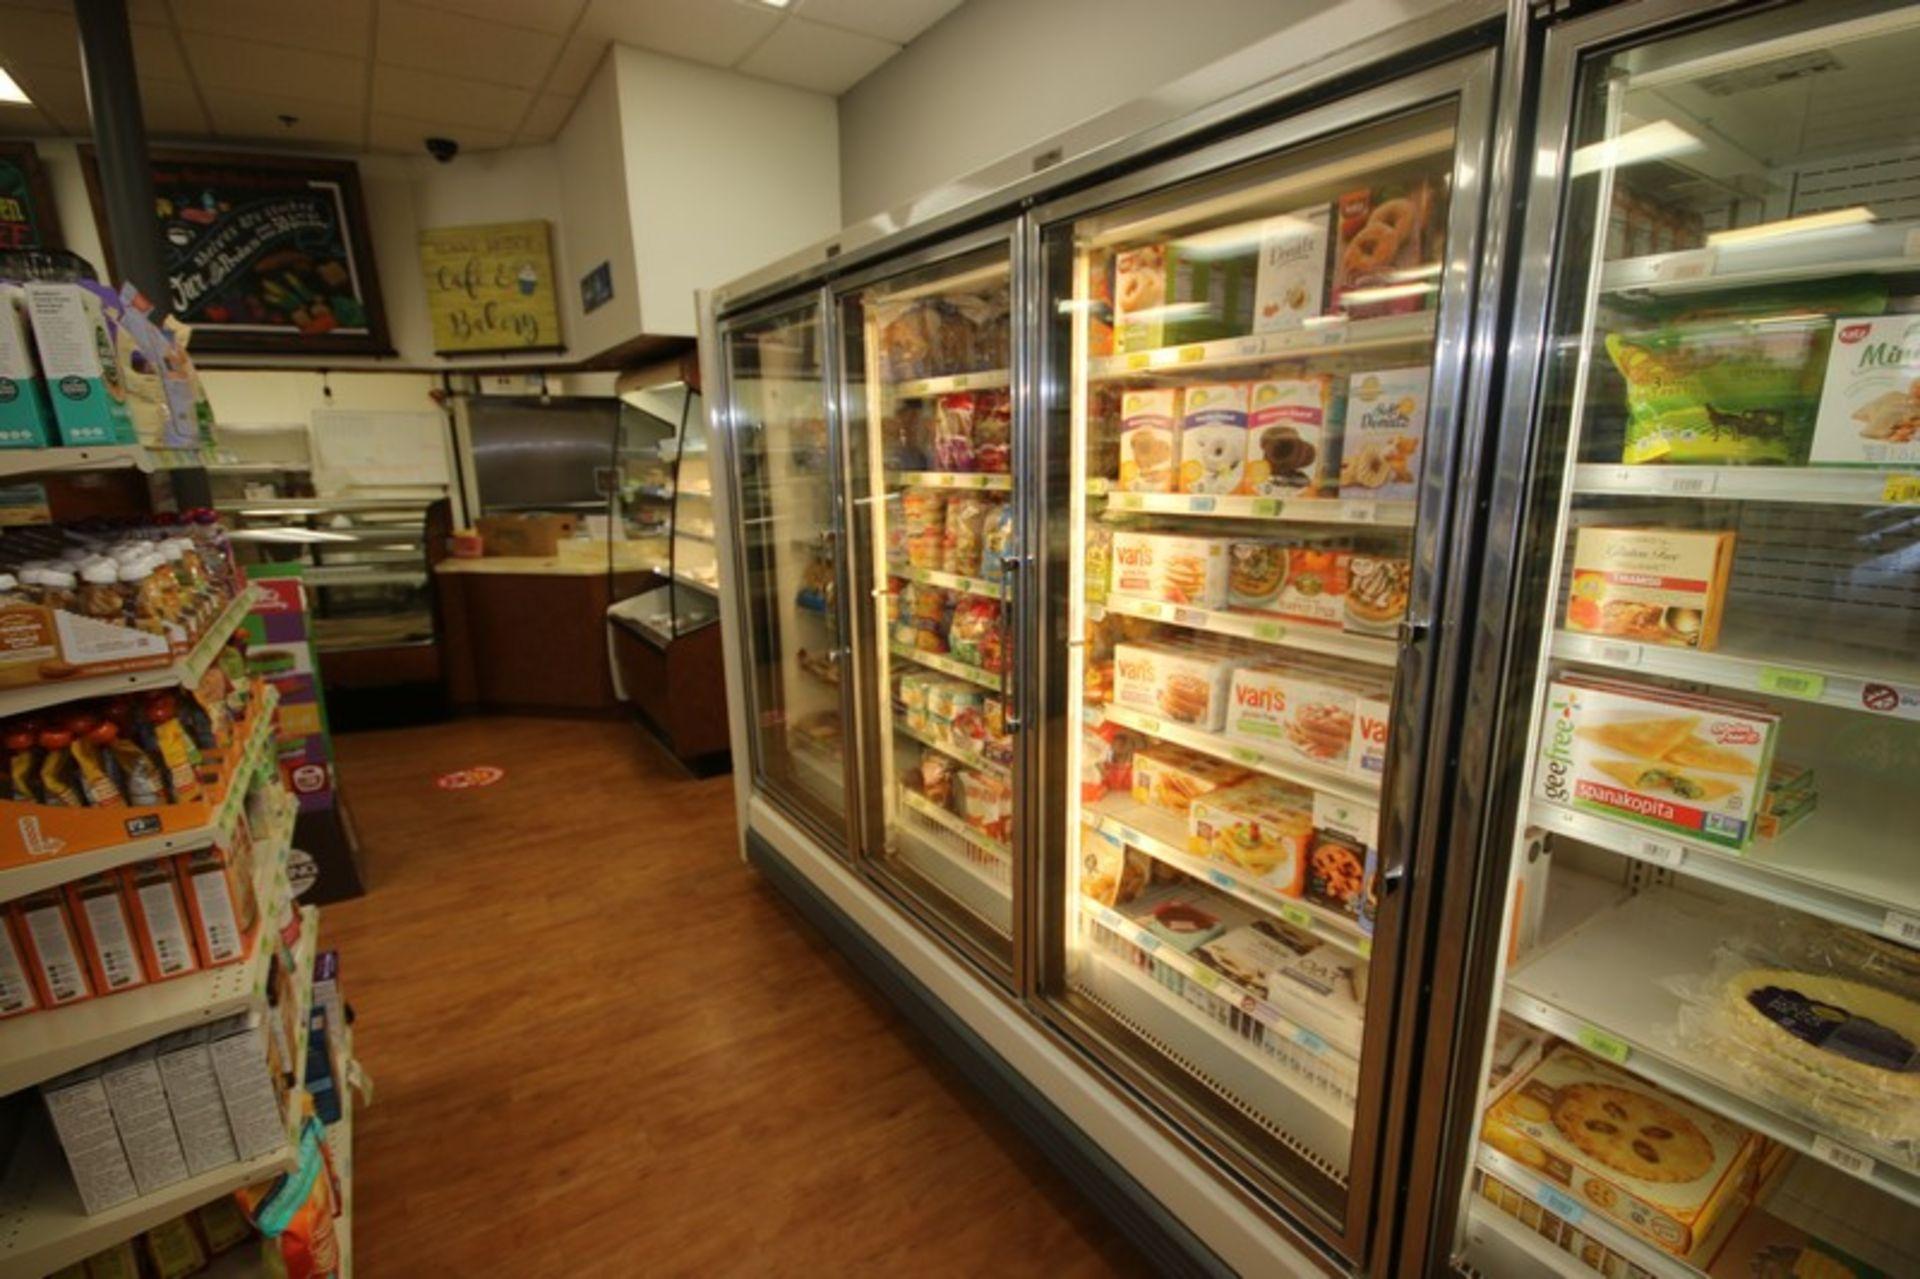 Hussman 3-Door Refrigeration Unit, M/N GEL-3, S/N 02BO1278-350, 115/208-230 Volts, 1 Phase,